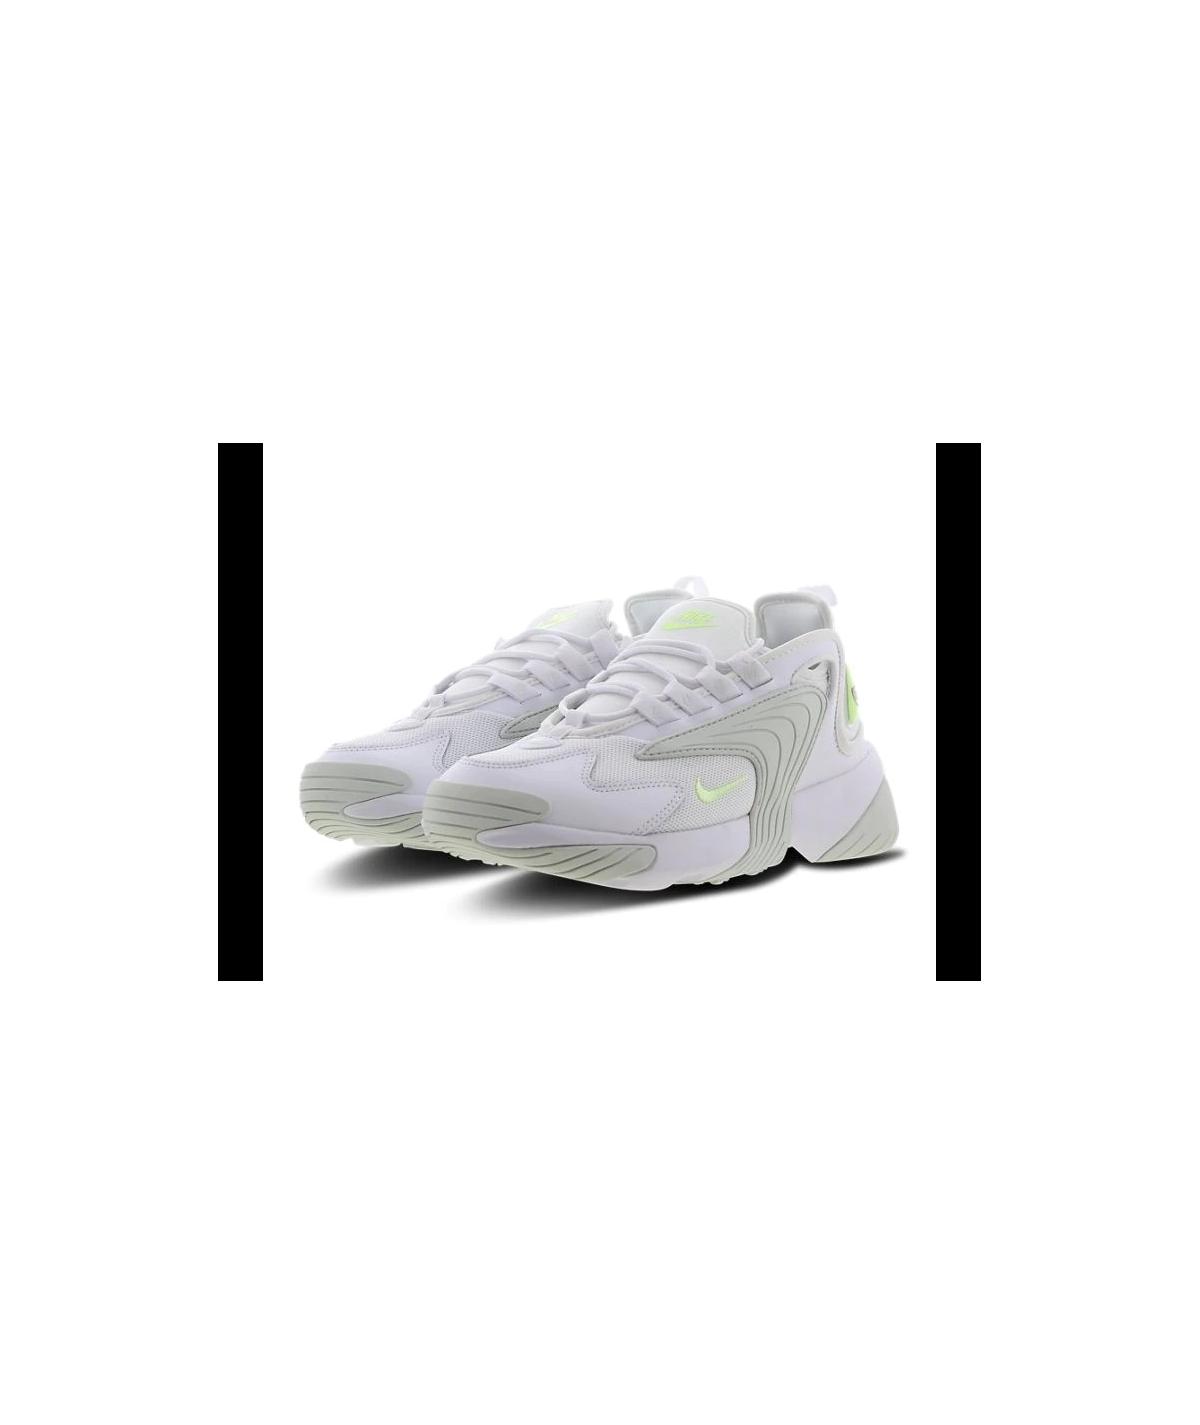 Nike Zoom 2K Originale I Chaussure Femme I Tendance fashion